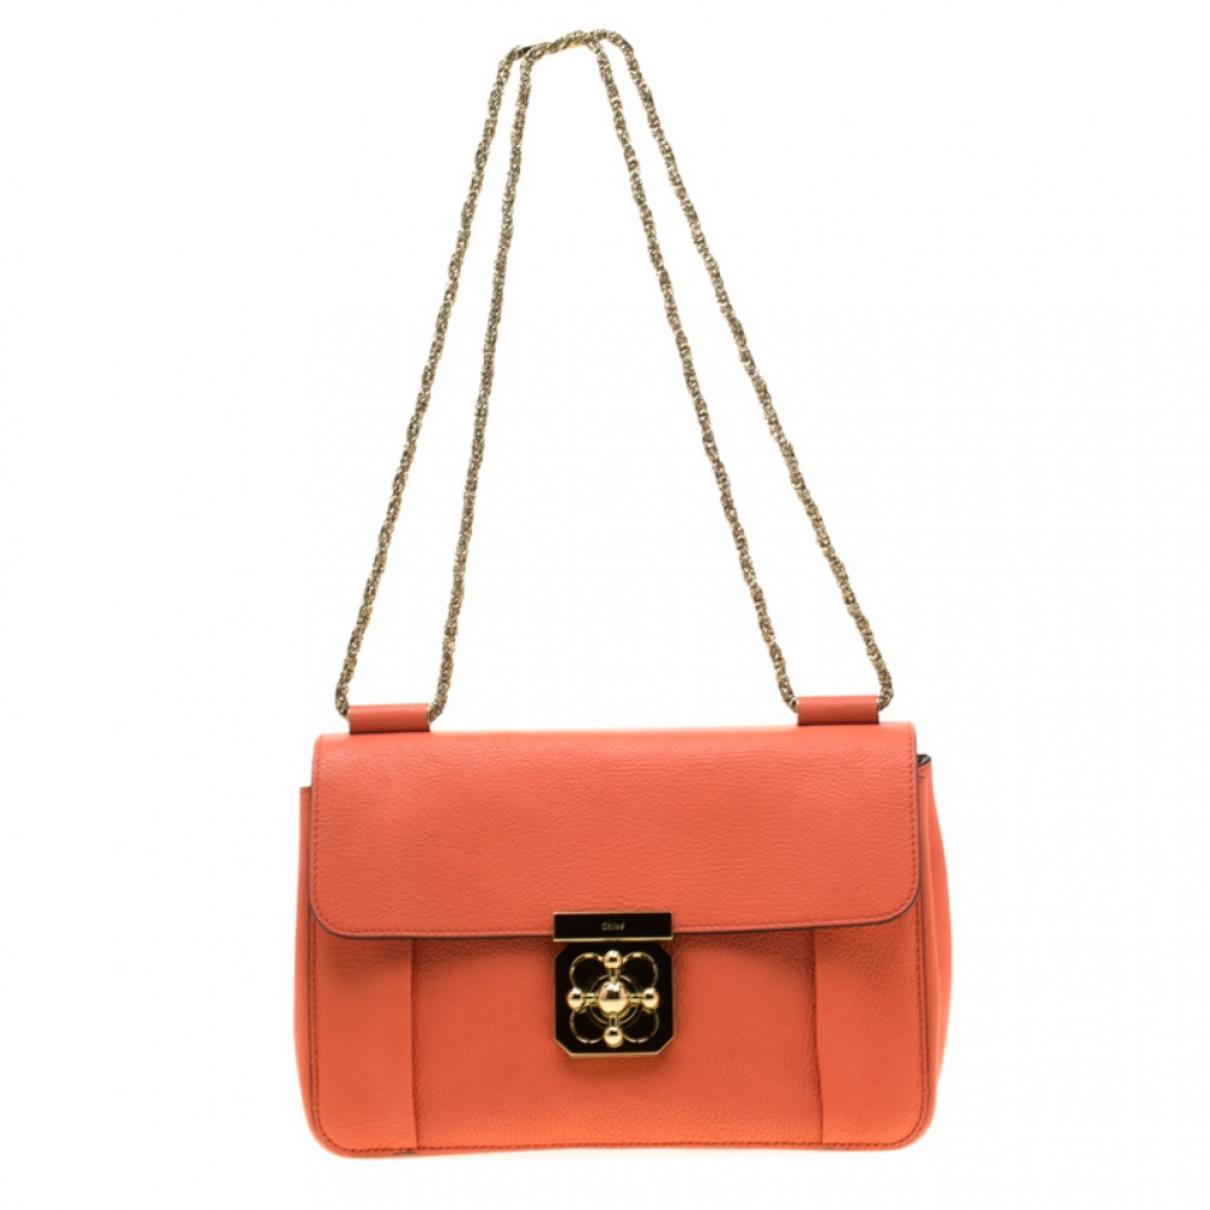 Chloé \N Orange Leather handbag for Women \N